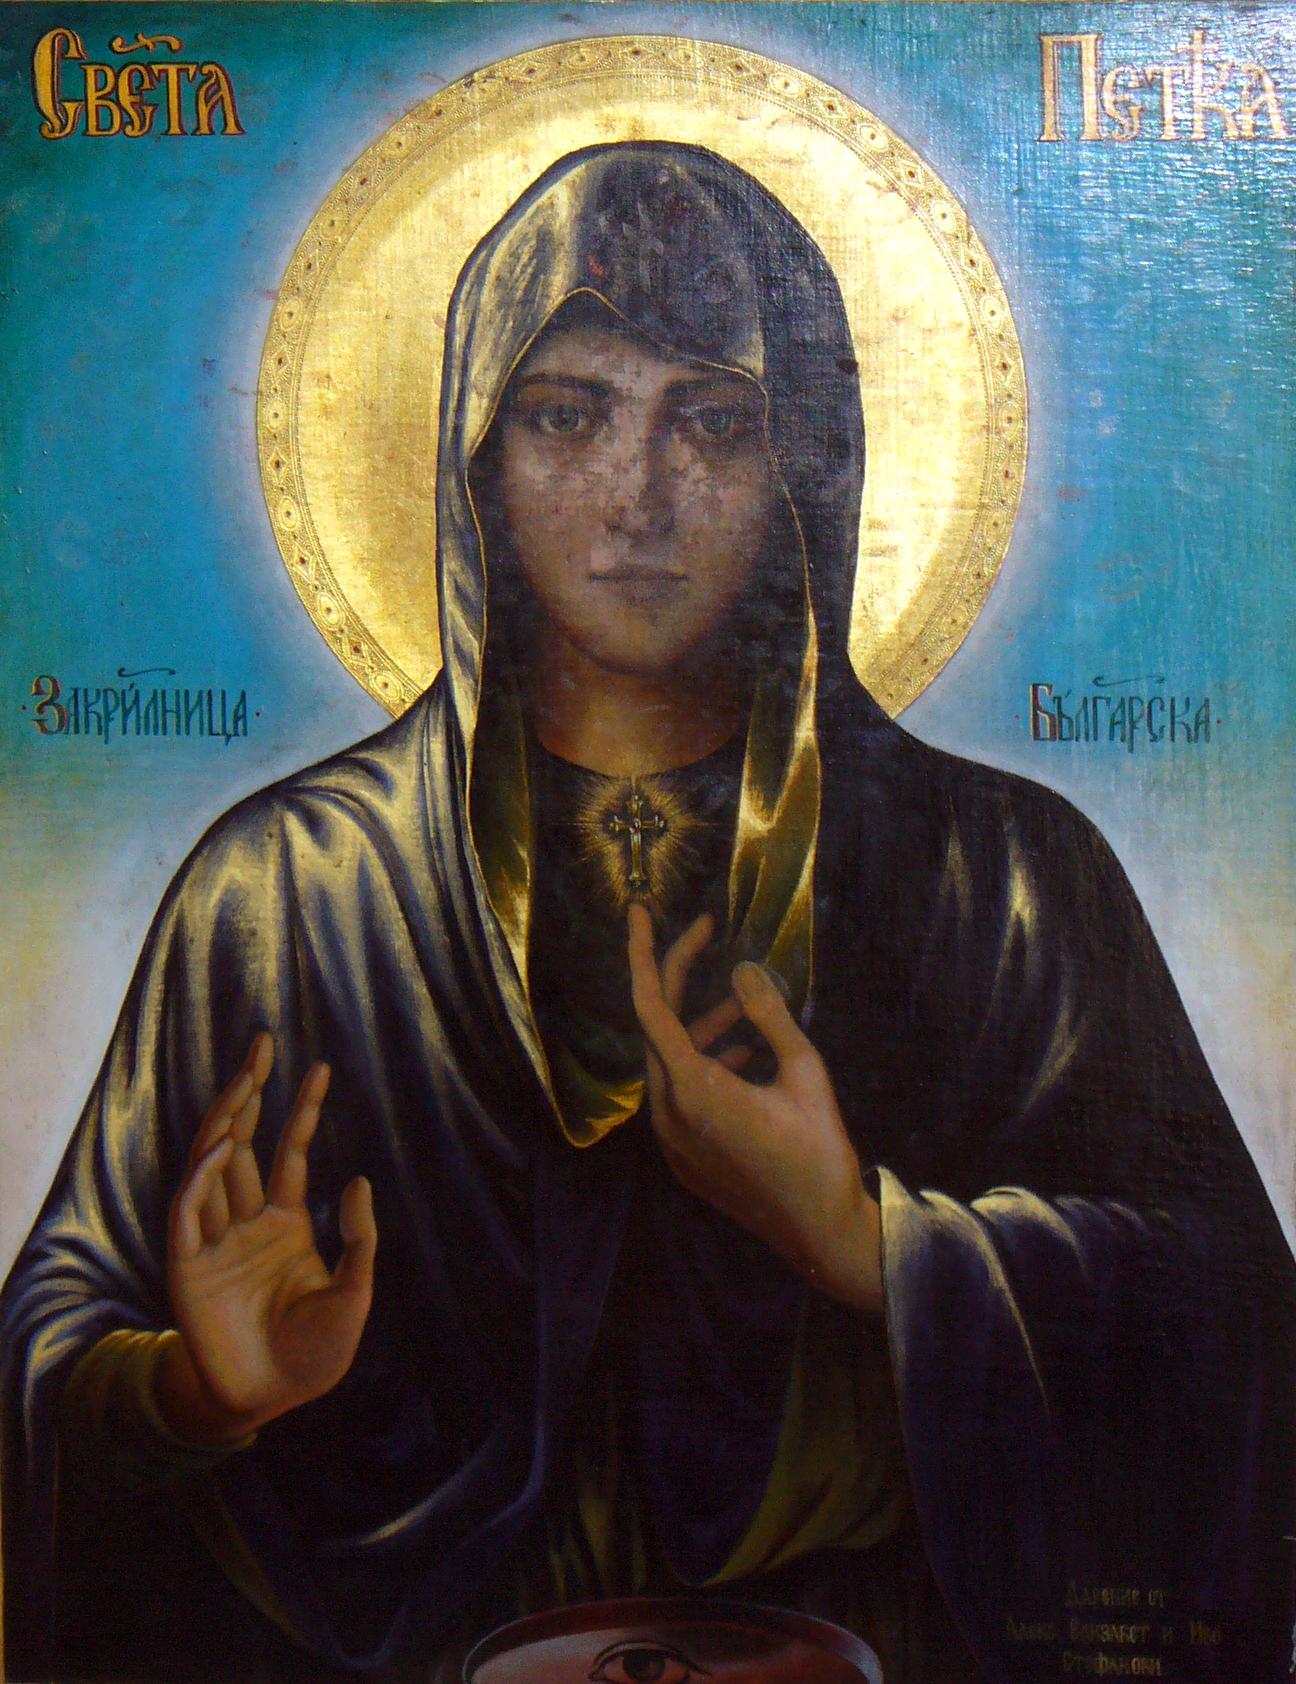 SFANTA PARASCHEVA - modul in care strainii o cheama pe Sfanta Parascheva in rugaciune